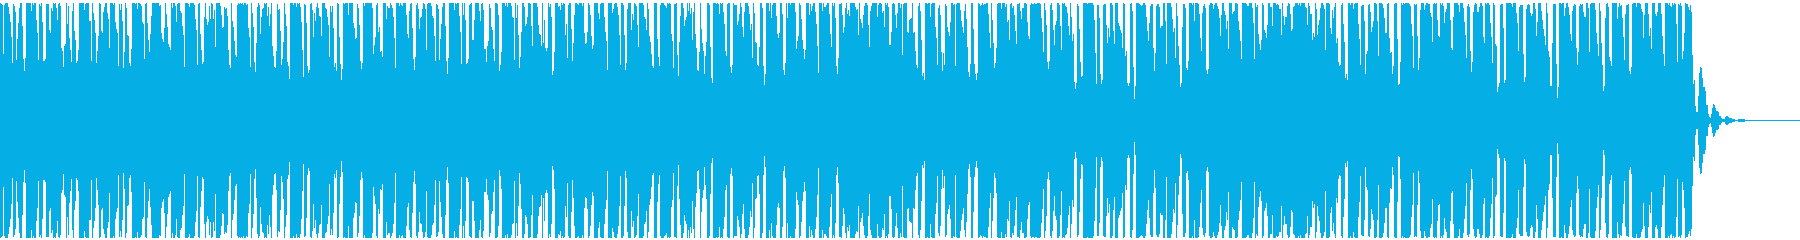 【EDM】トランス、ミディアム3の再生済みの波形